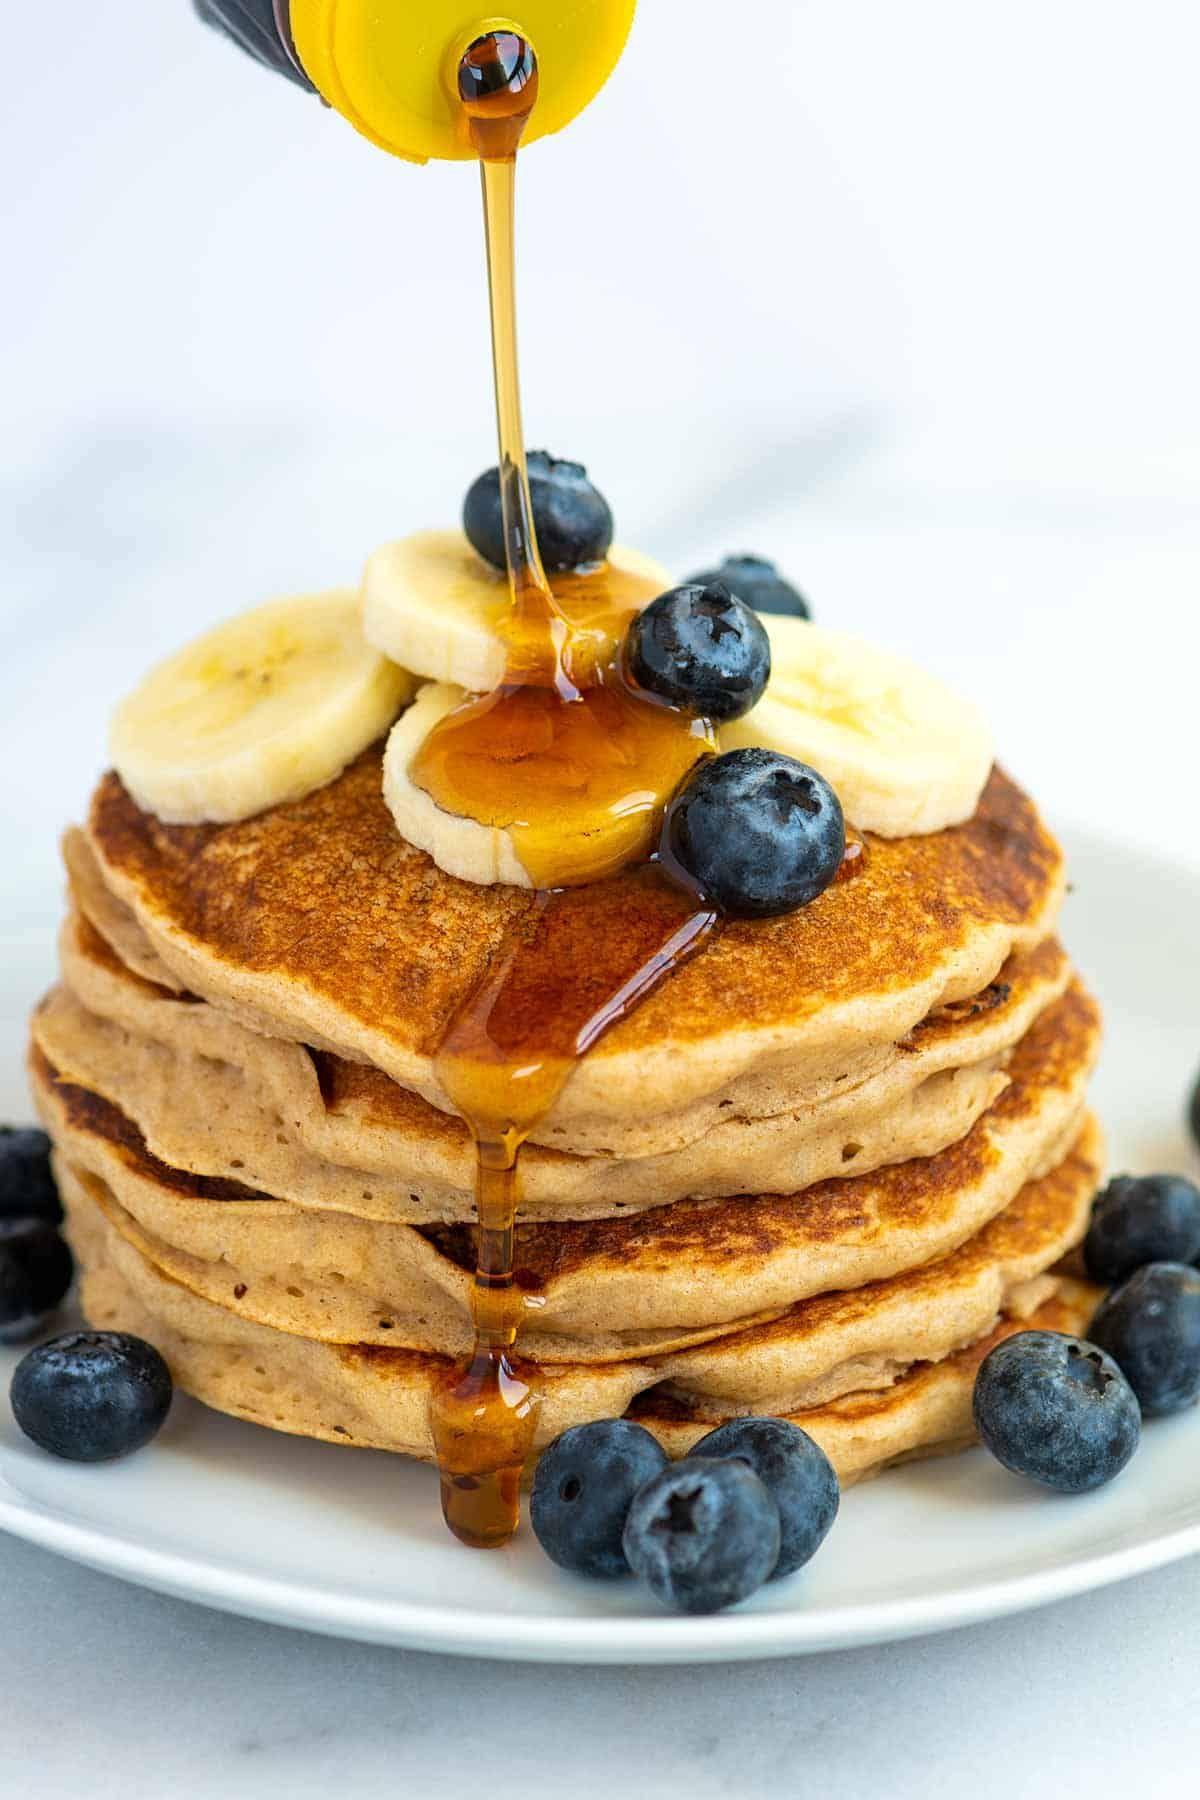 Extra Easy Vegan Pancakes Recipe In 2020 Vegan Pancakes Easy Christmas Food Desserts Vegan Pancakes